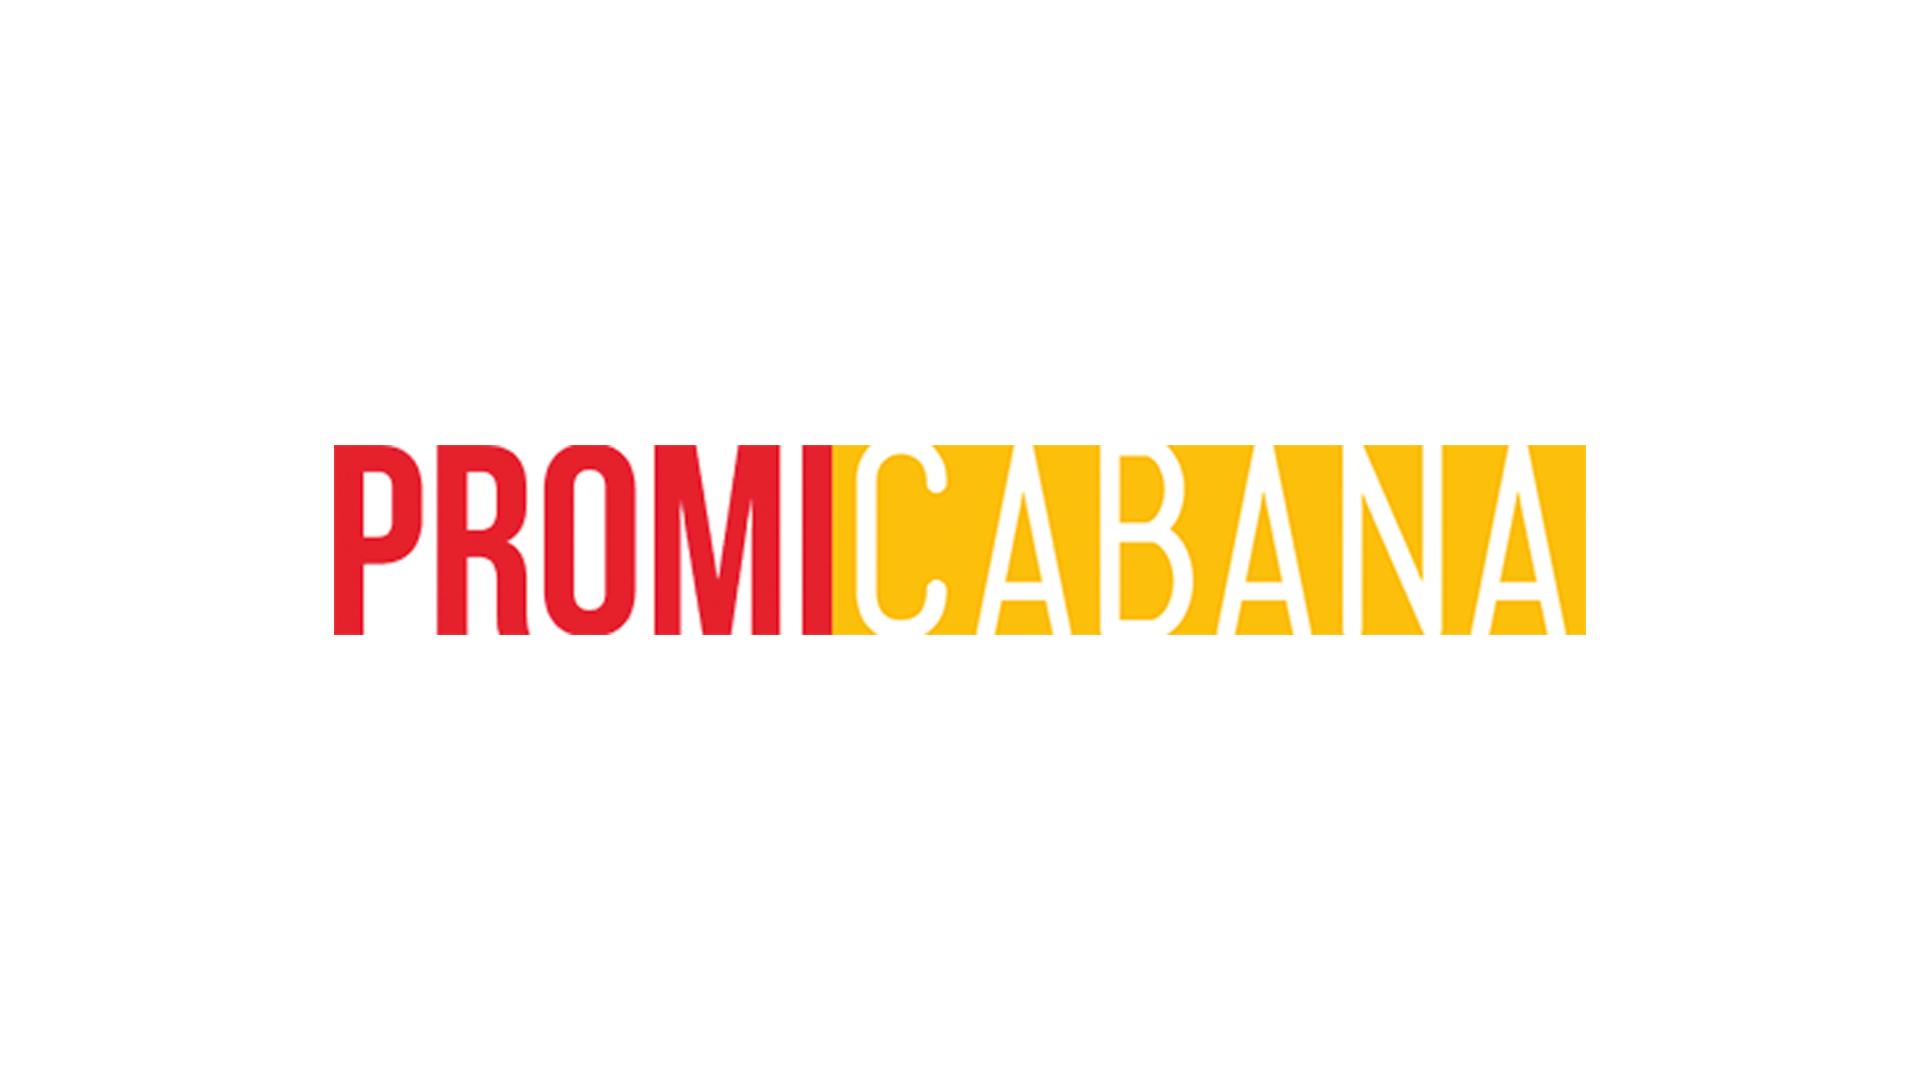 The-Good-Wife-Julianna-Margulies-Jeffrey-Dean-Morgan-Alicia-Jason